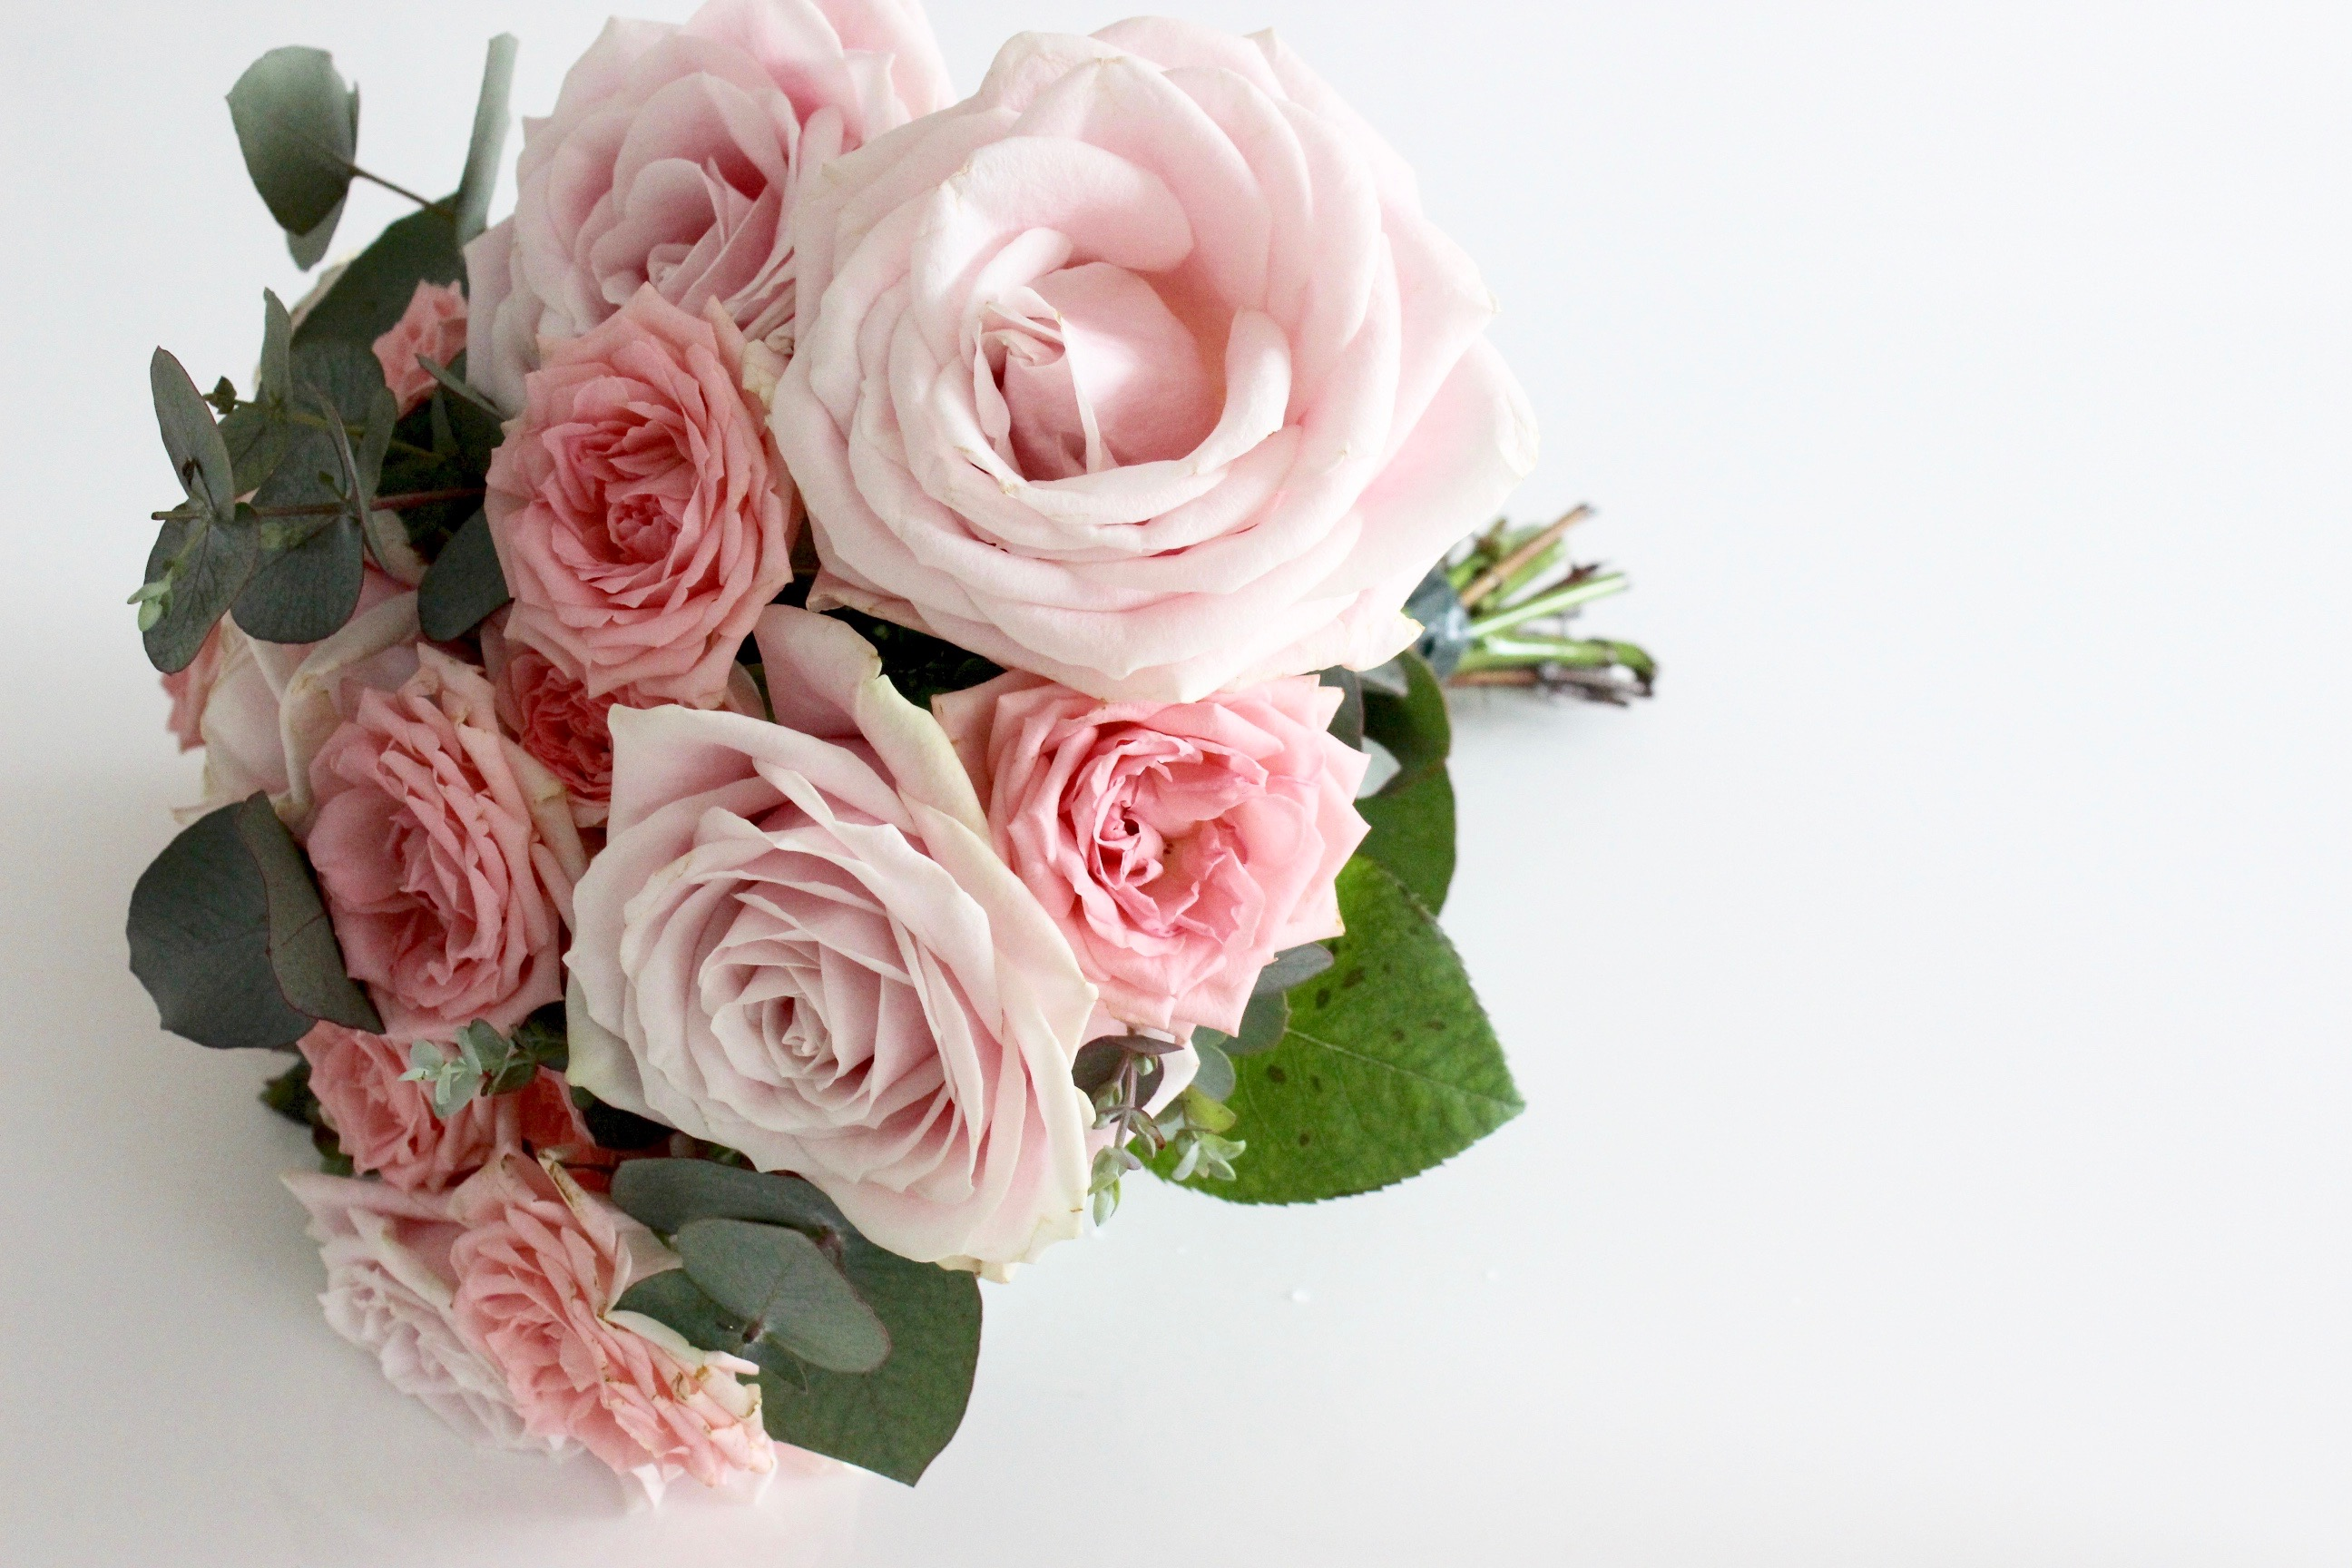 Blog-This-Kind-Of-Girl-5-little-things-Bergamotte-26